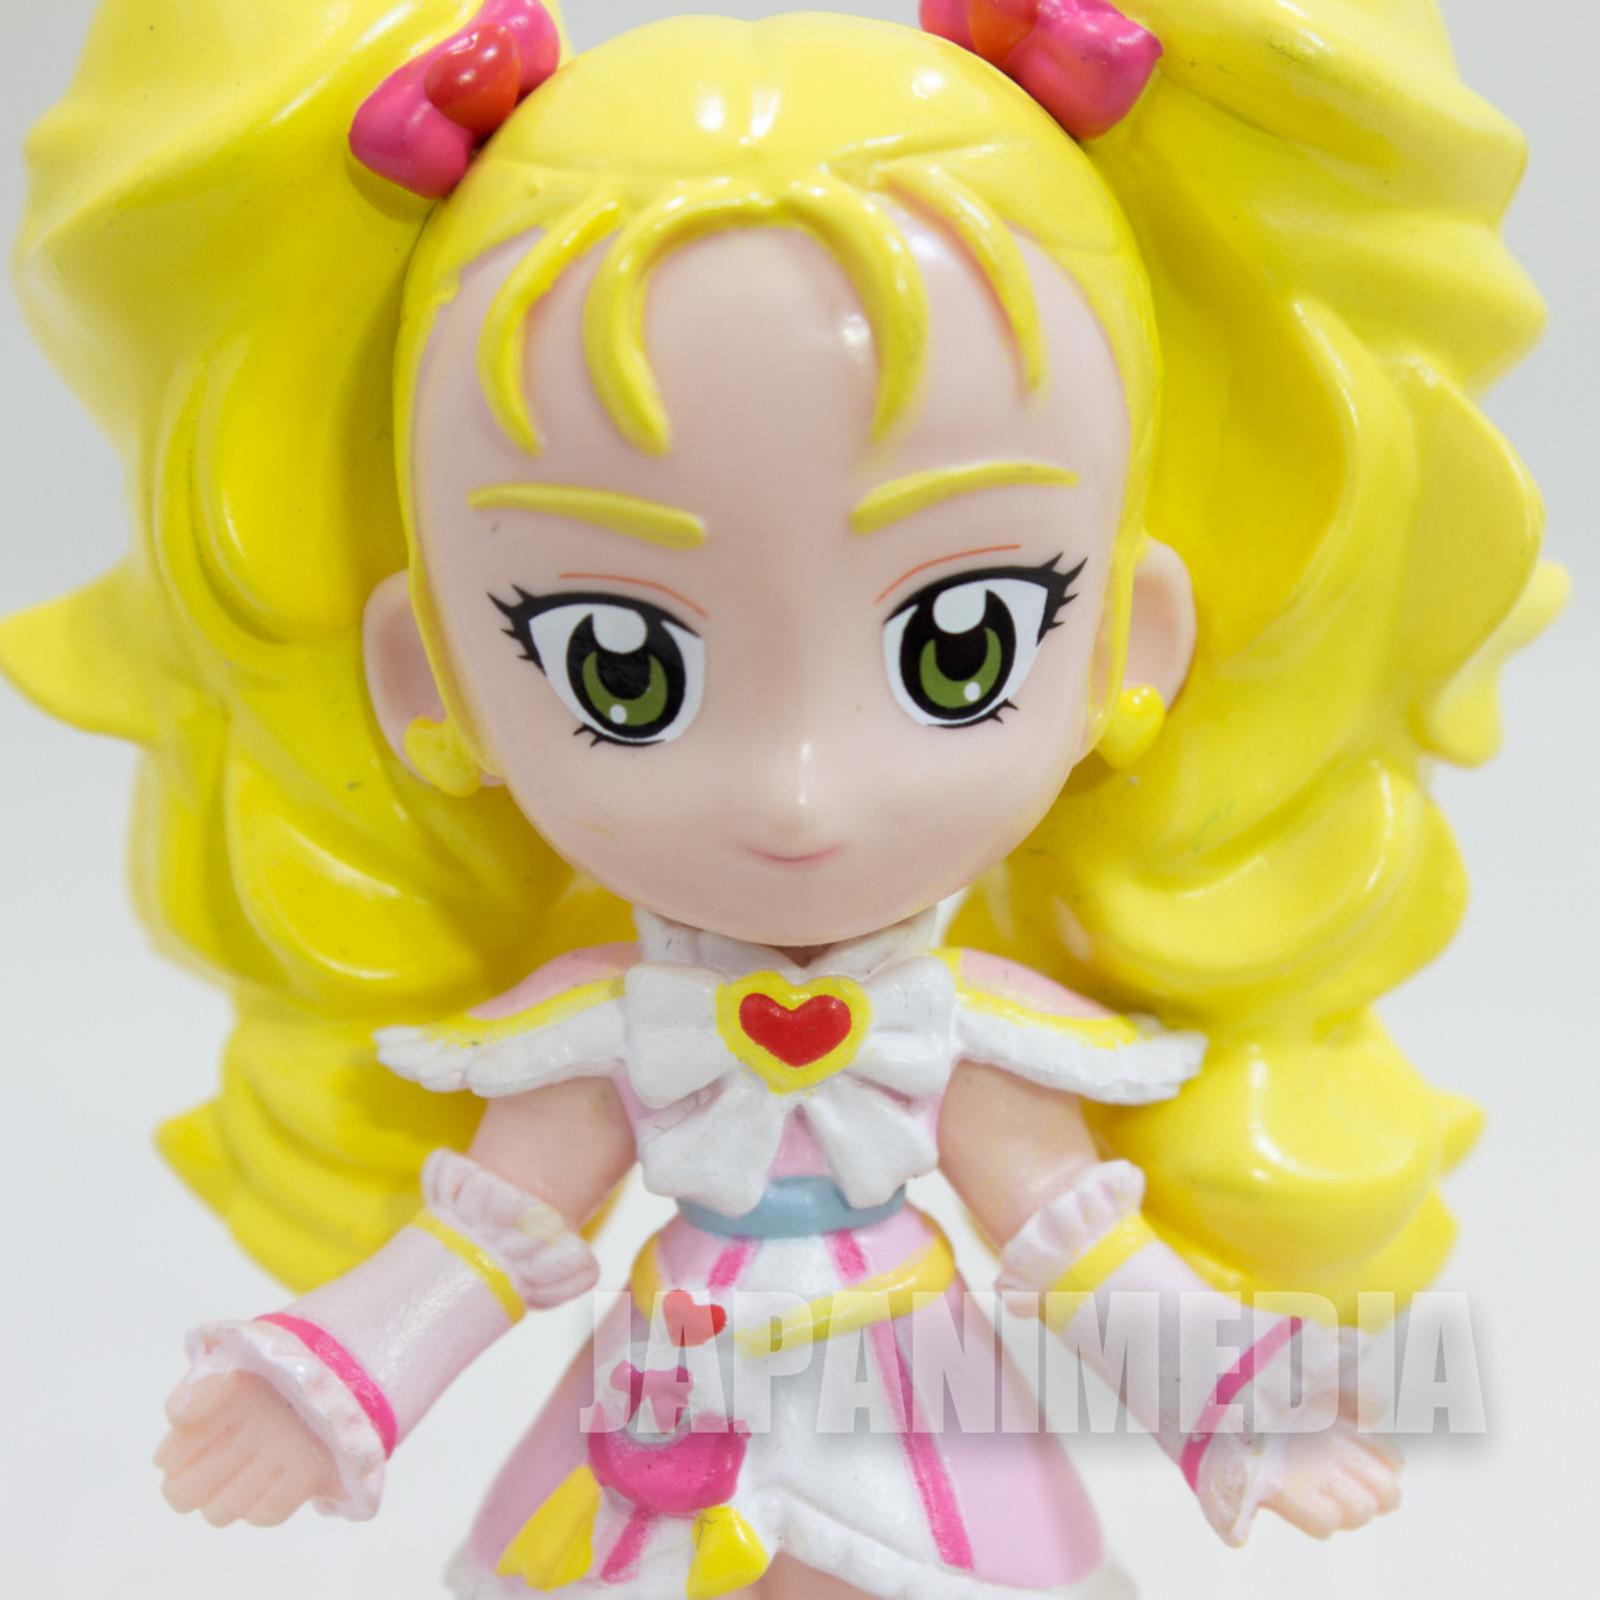 Futari wa Pretty Cure Max Heart Shiny Luminous (Hikari Kujo) Petit cute Figure JAPAN ANIME